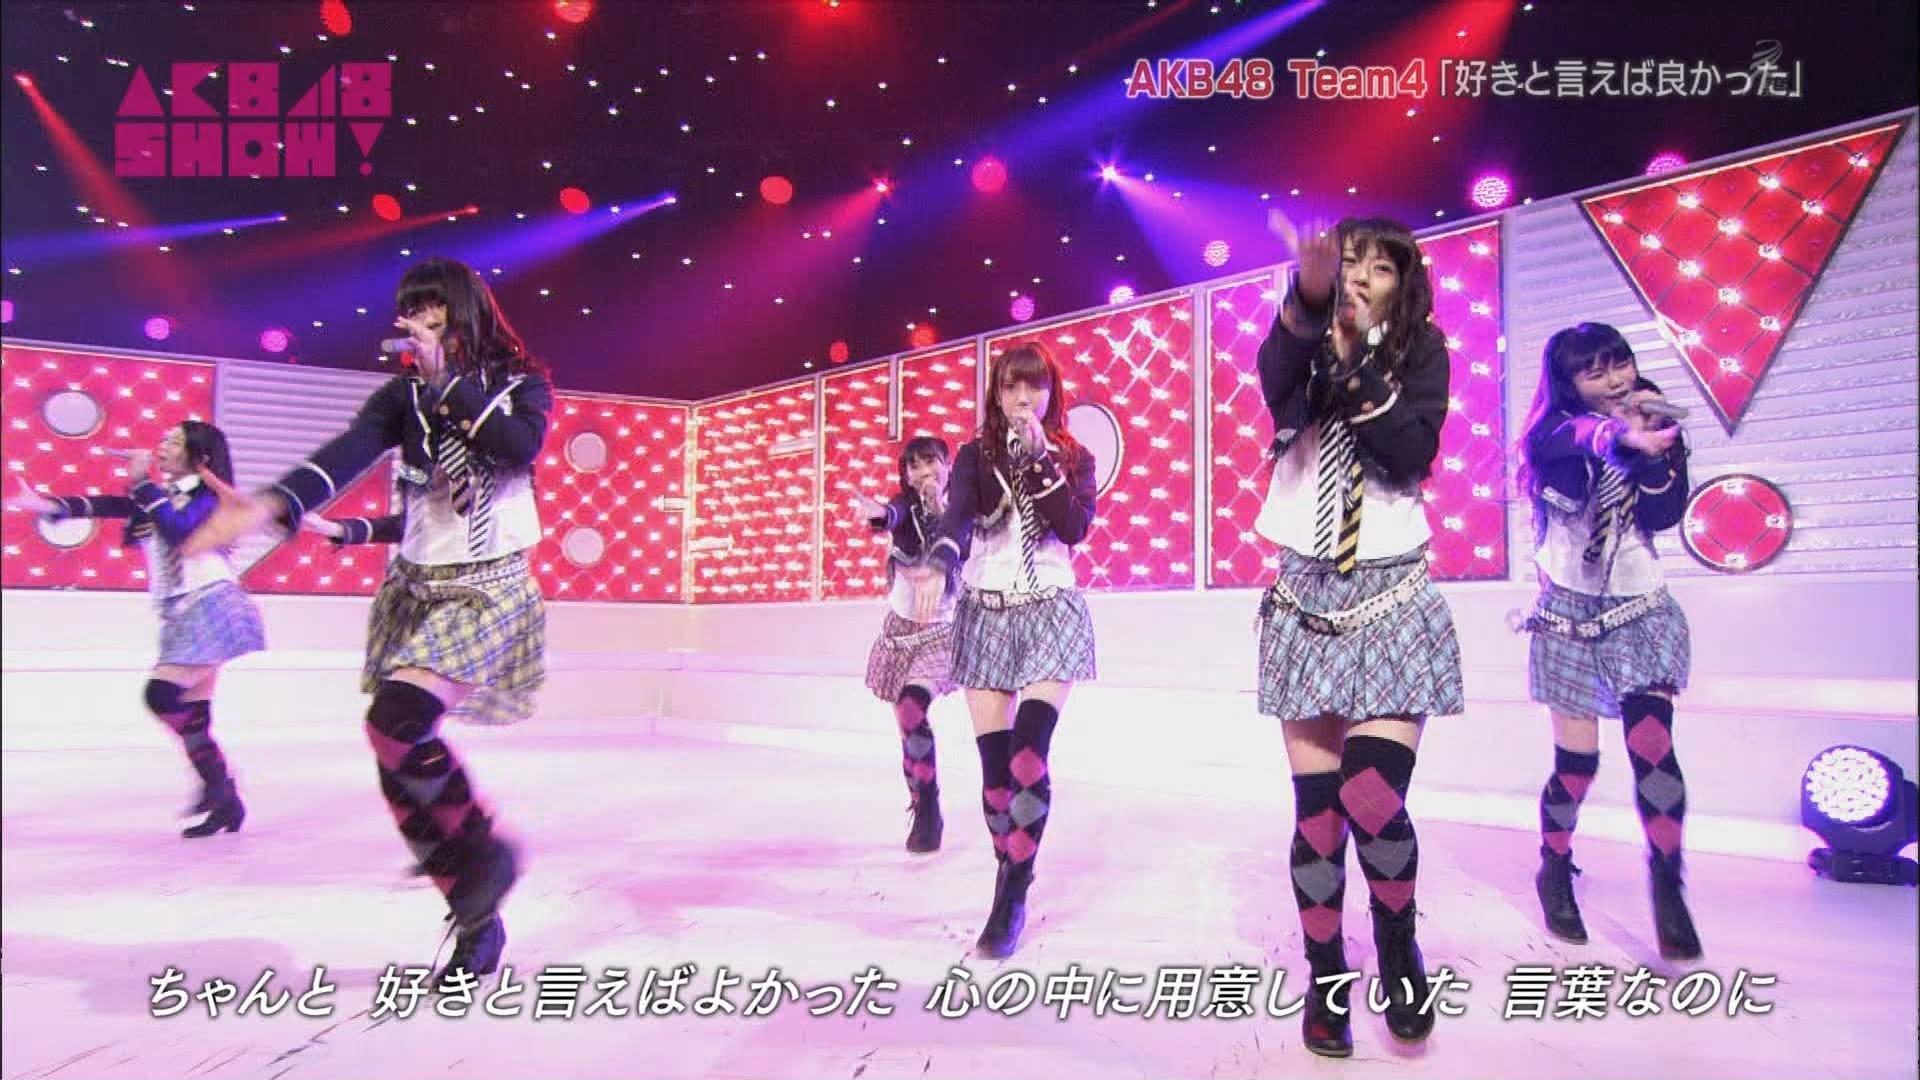 AKB48SHOW チーム4好きといえば良かった 加藤玲奈 20140830 (5)